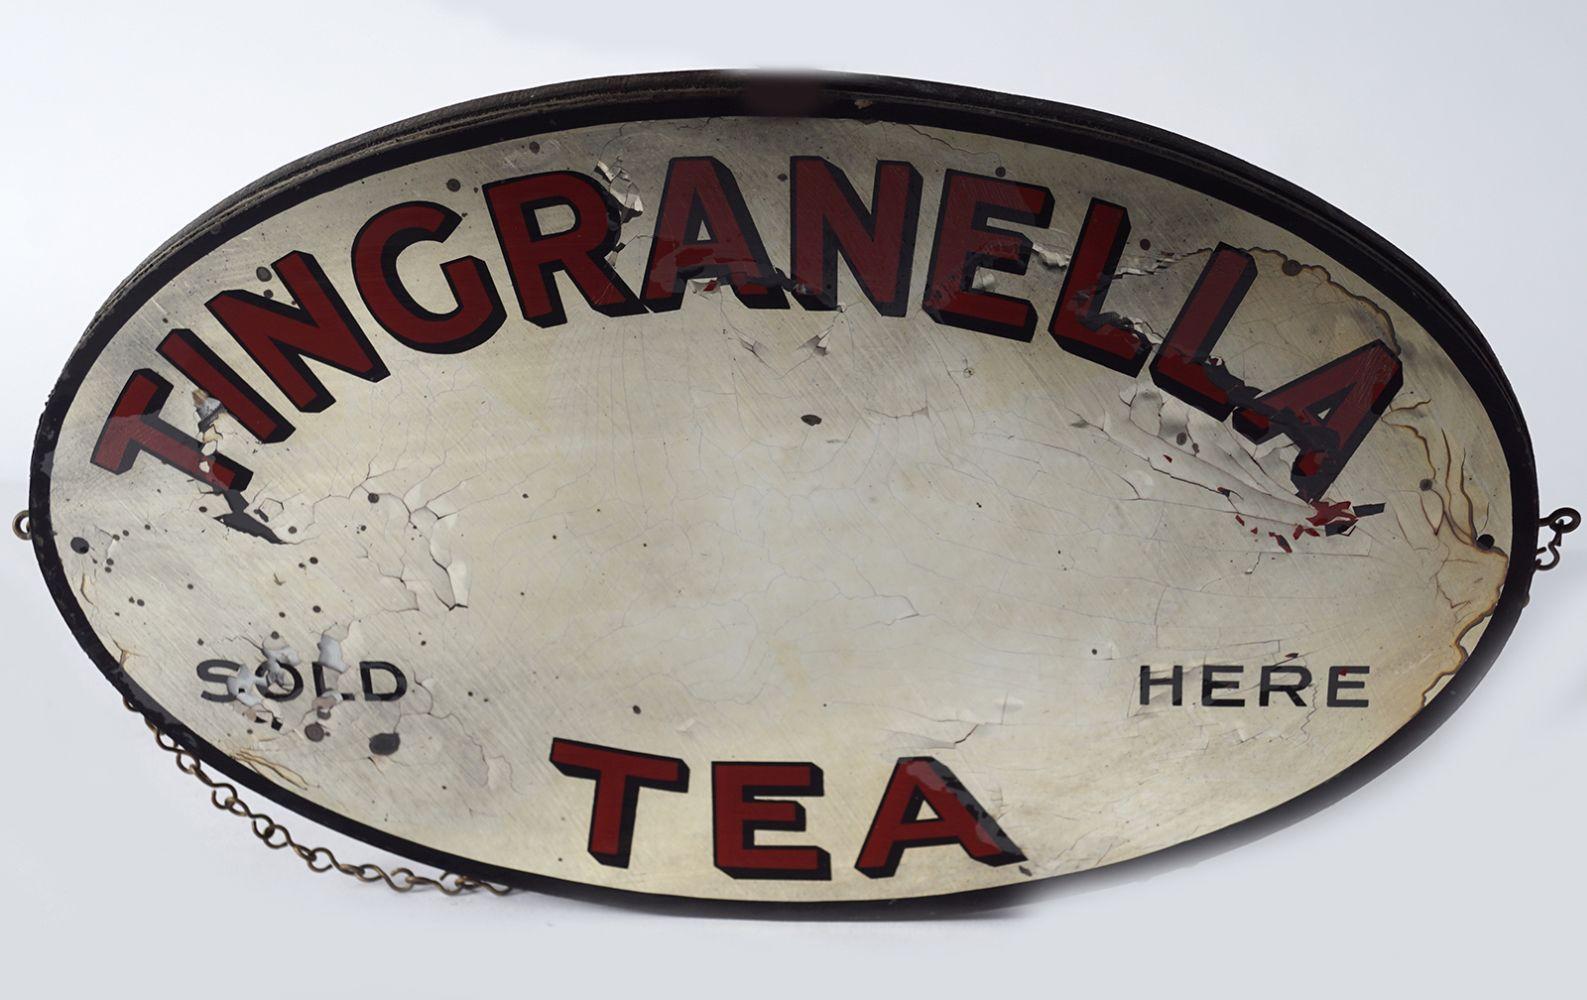 TINGRANELLA TEA ORIGINAL ADVERTISEMENT MIRROR